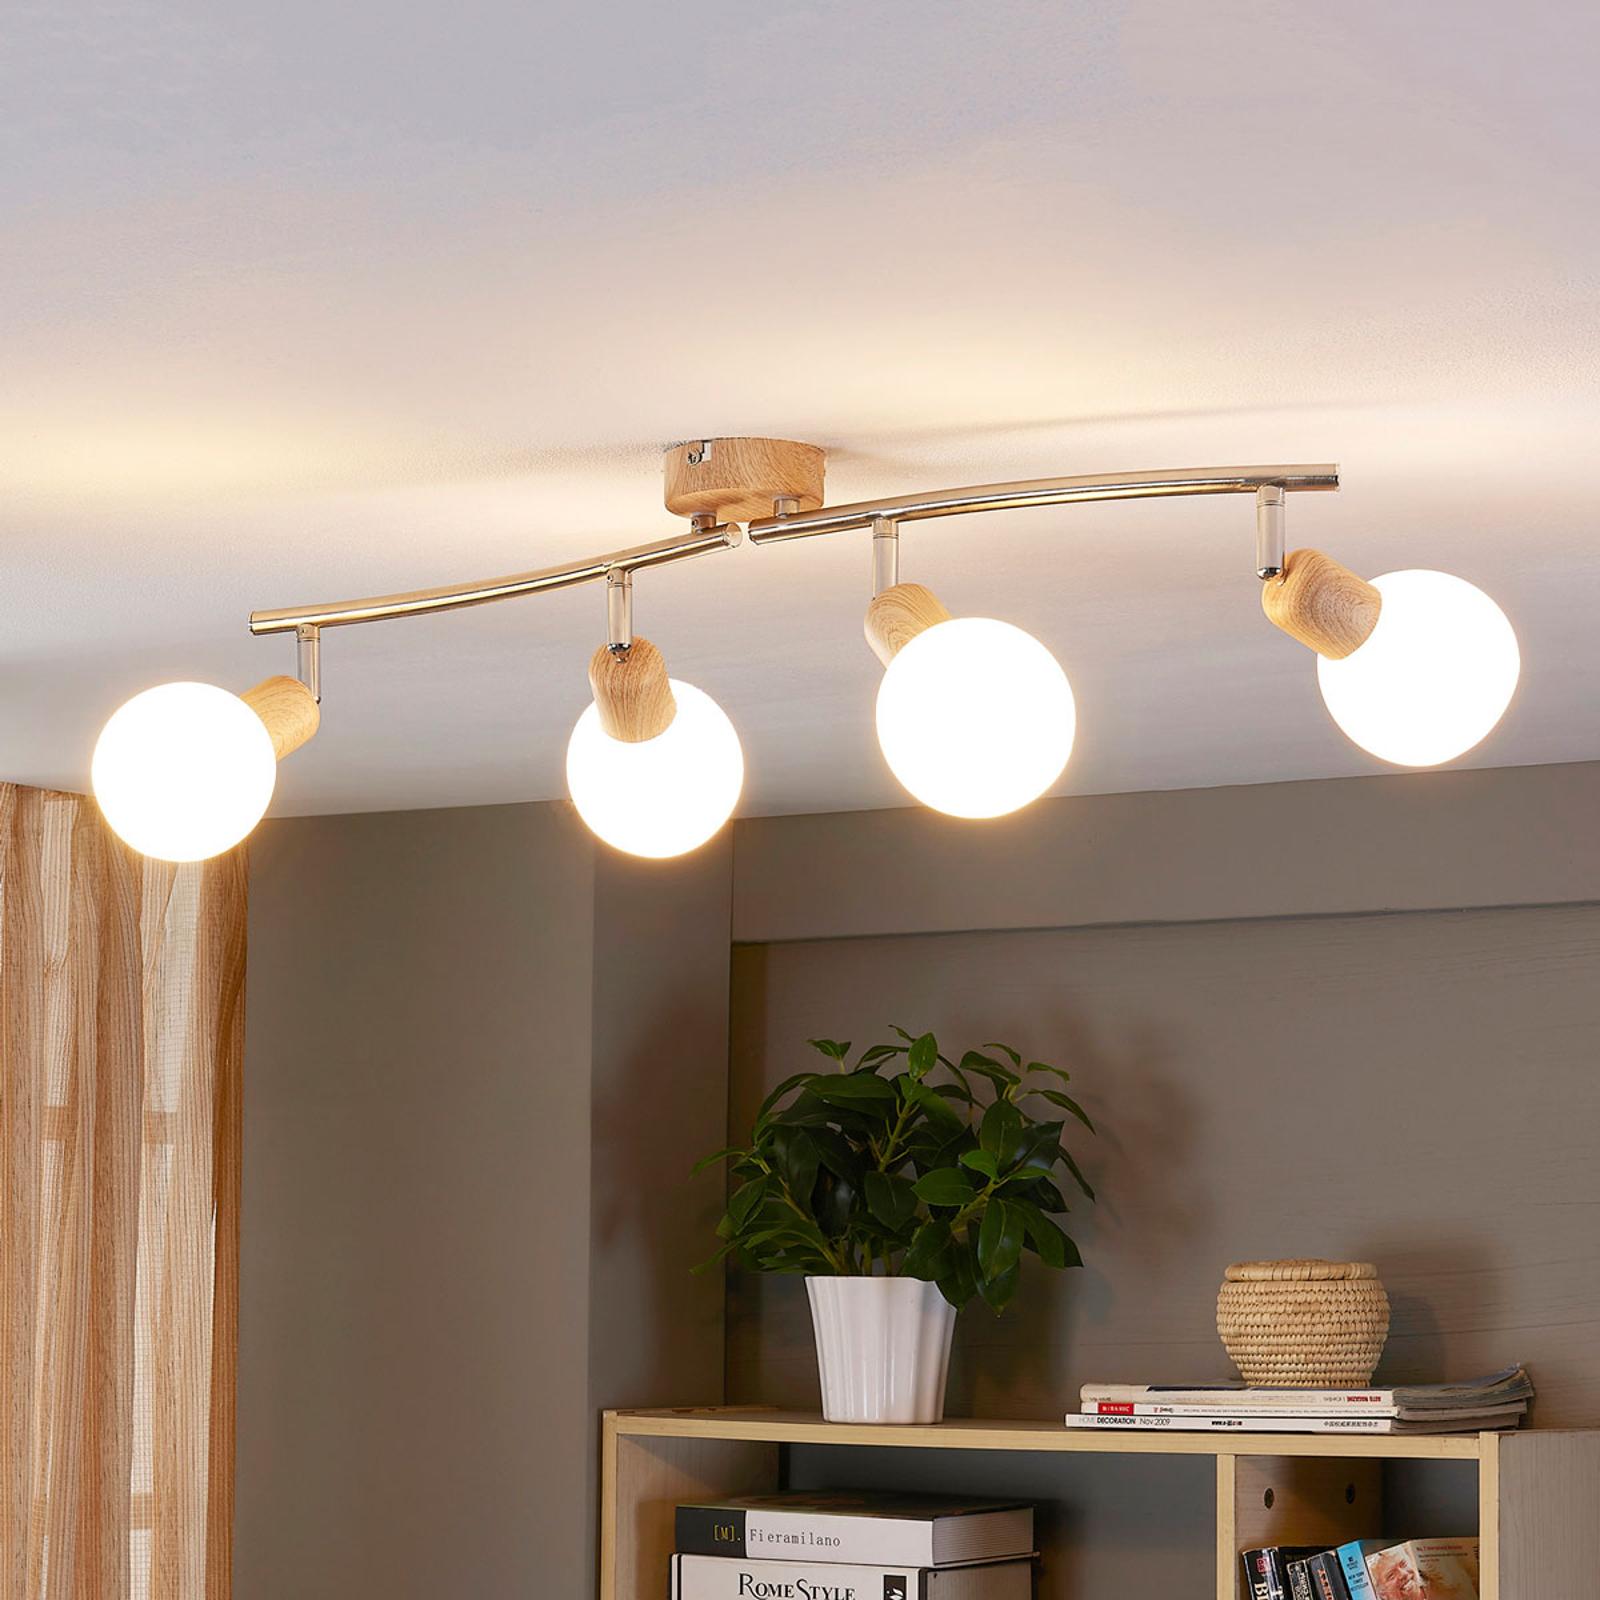 4-bulb LED ceiling lamp Svenka with wood effect_9621050_1